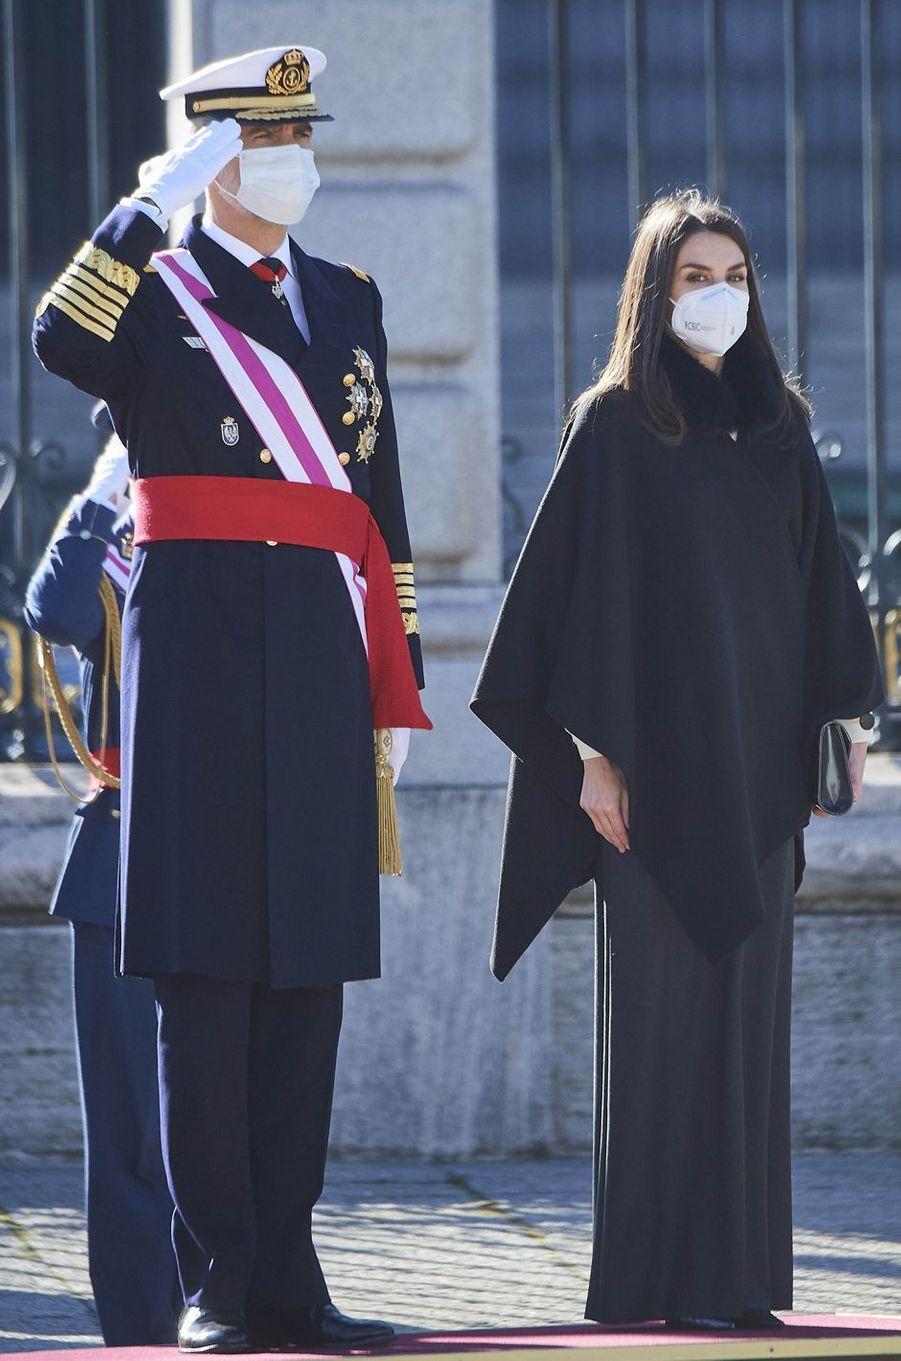 La reine Letizia d'Espagne dans sa cape Carolina Herrera à la Pascua Militar, le 6 janvier 2021